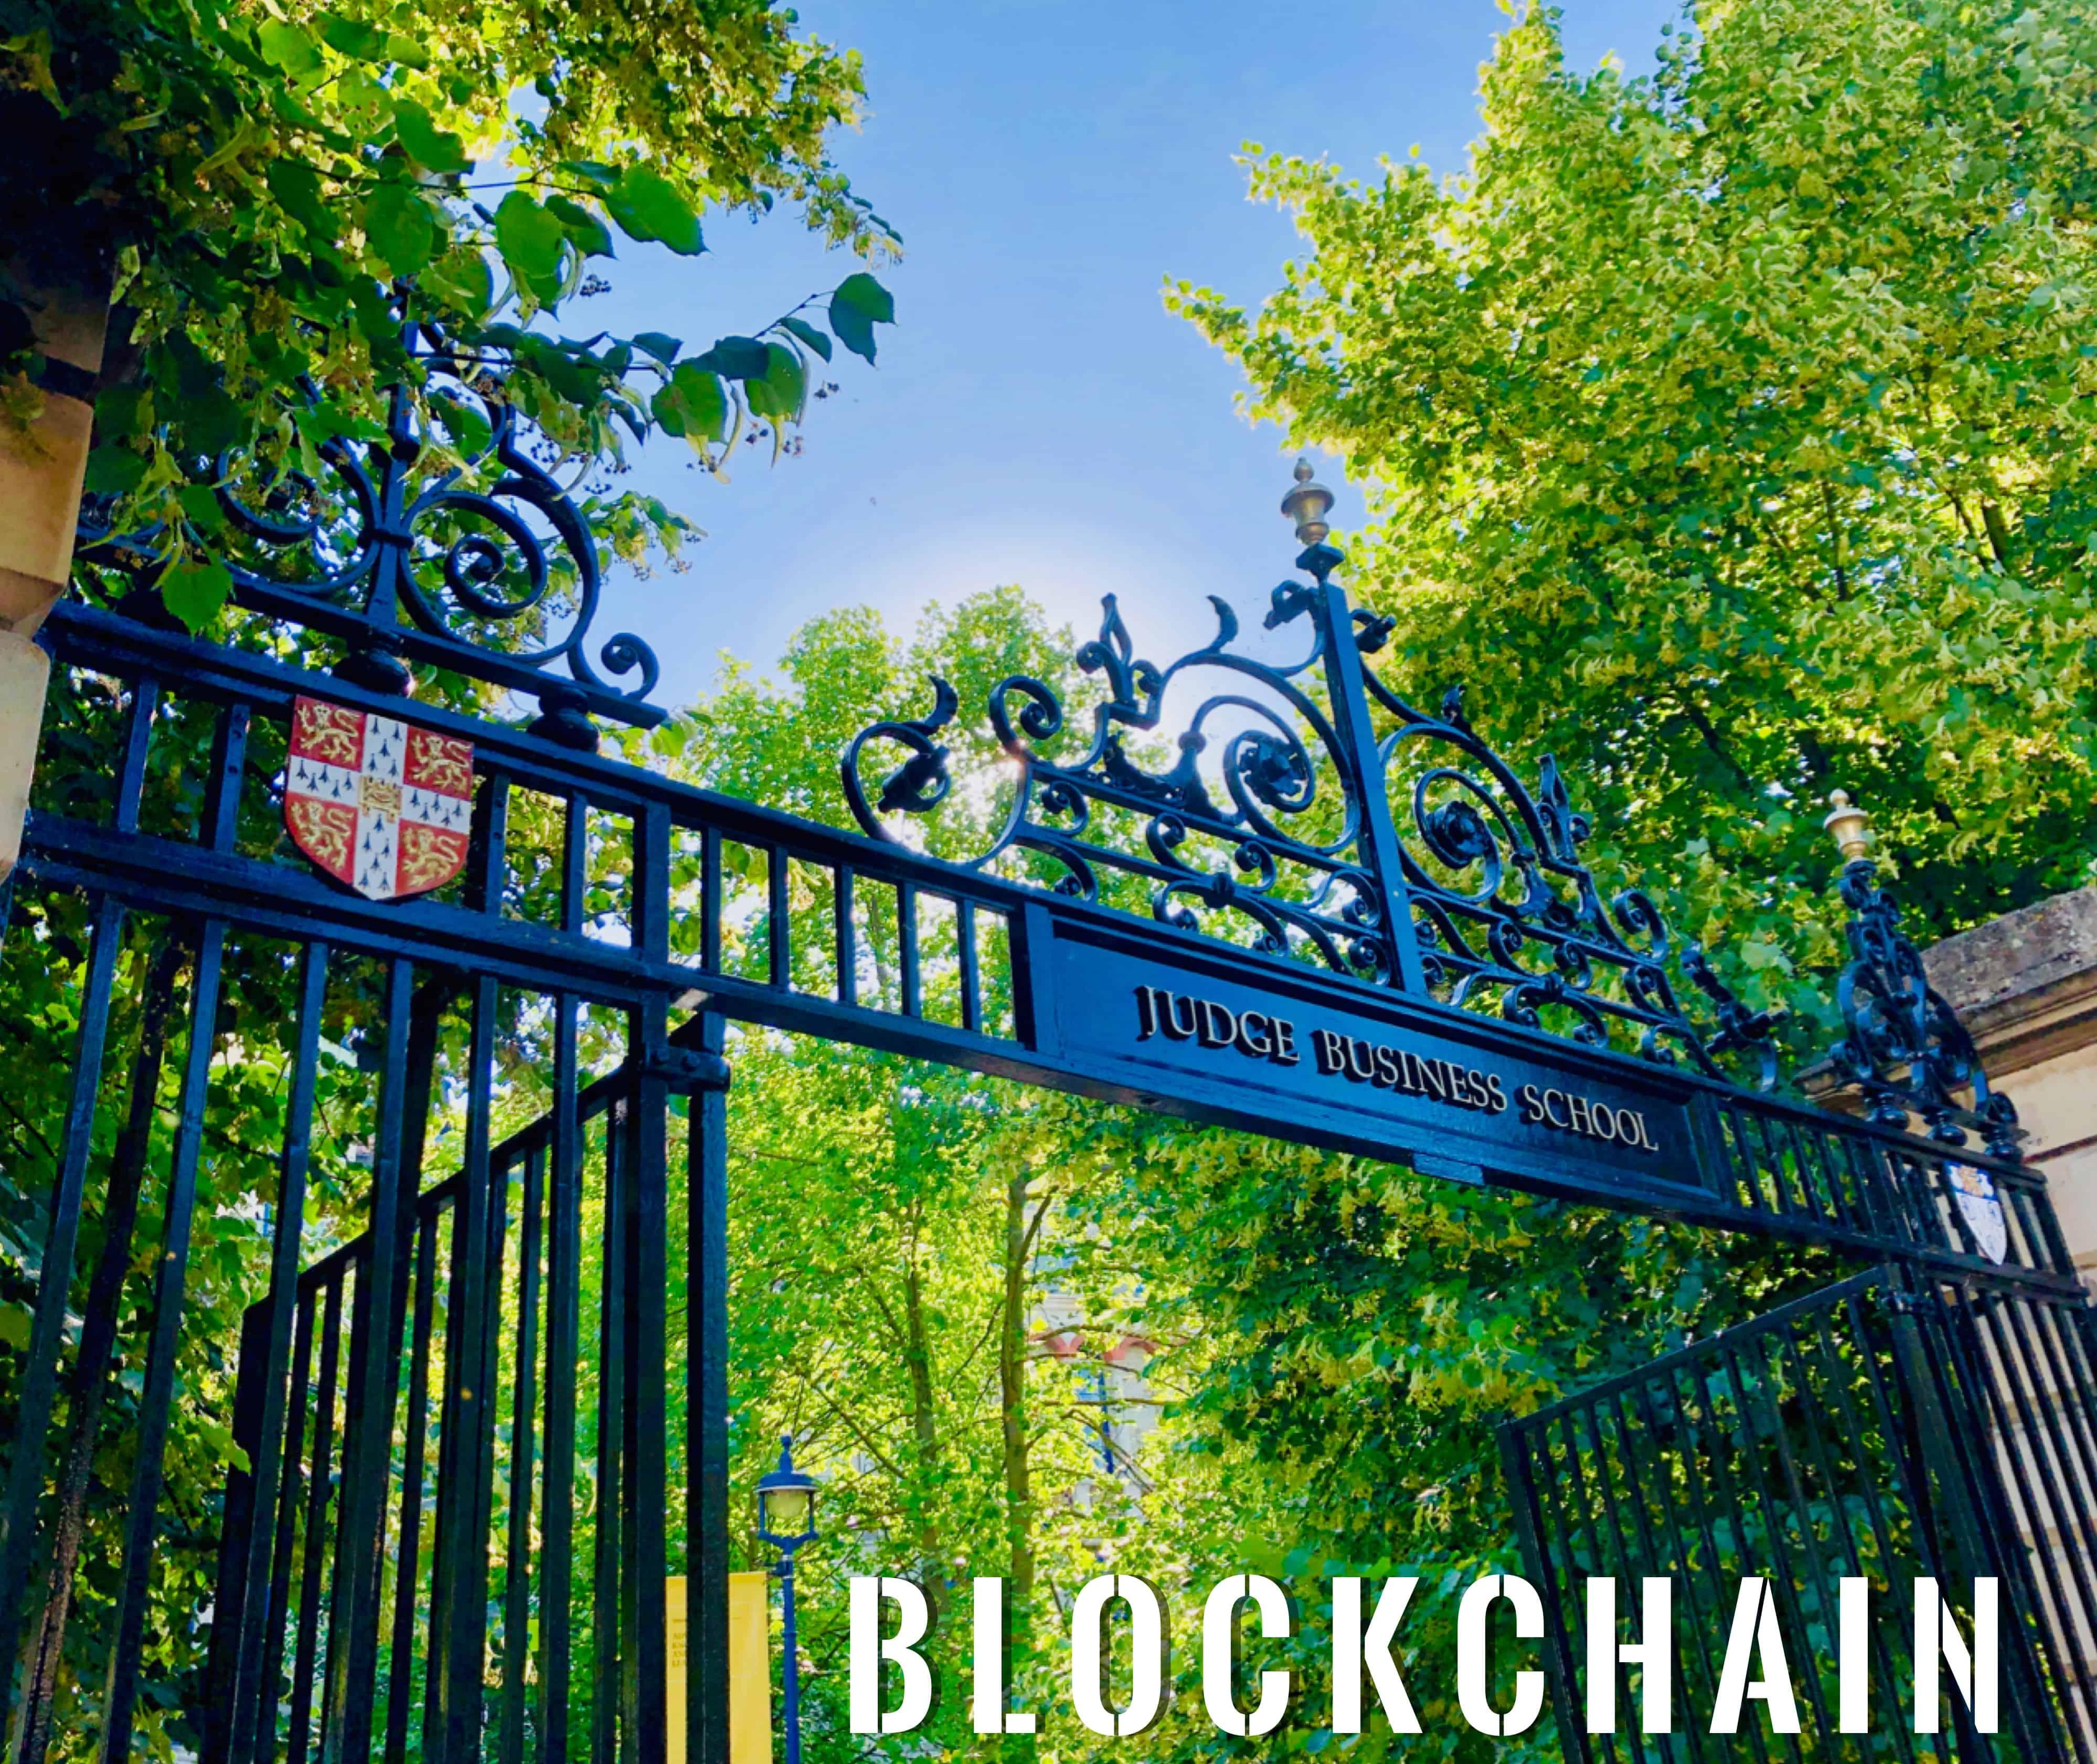 Cambridge Centre for Alternative Finance Publishes 2nd Global Blockchain Report: Enterprise Utilization and Network Development